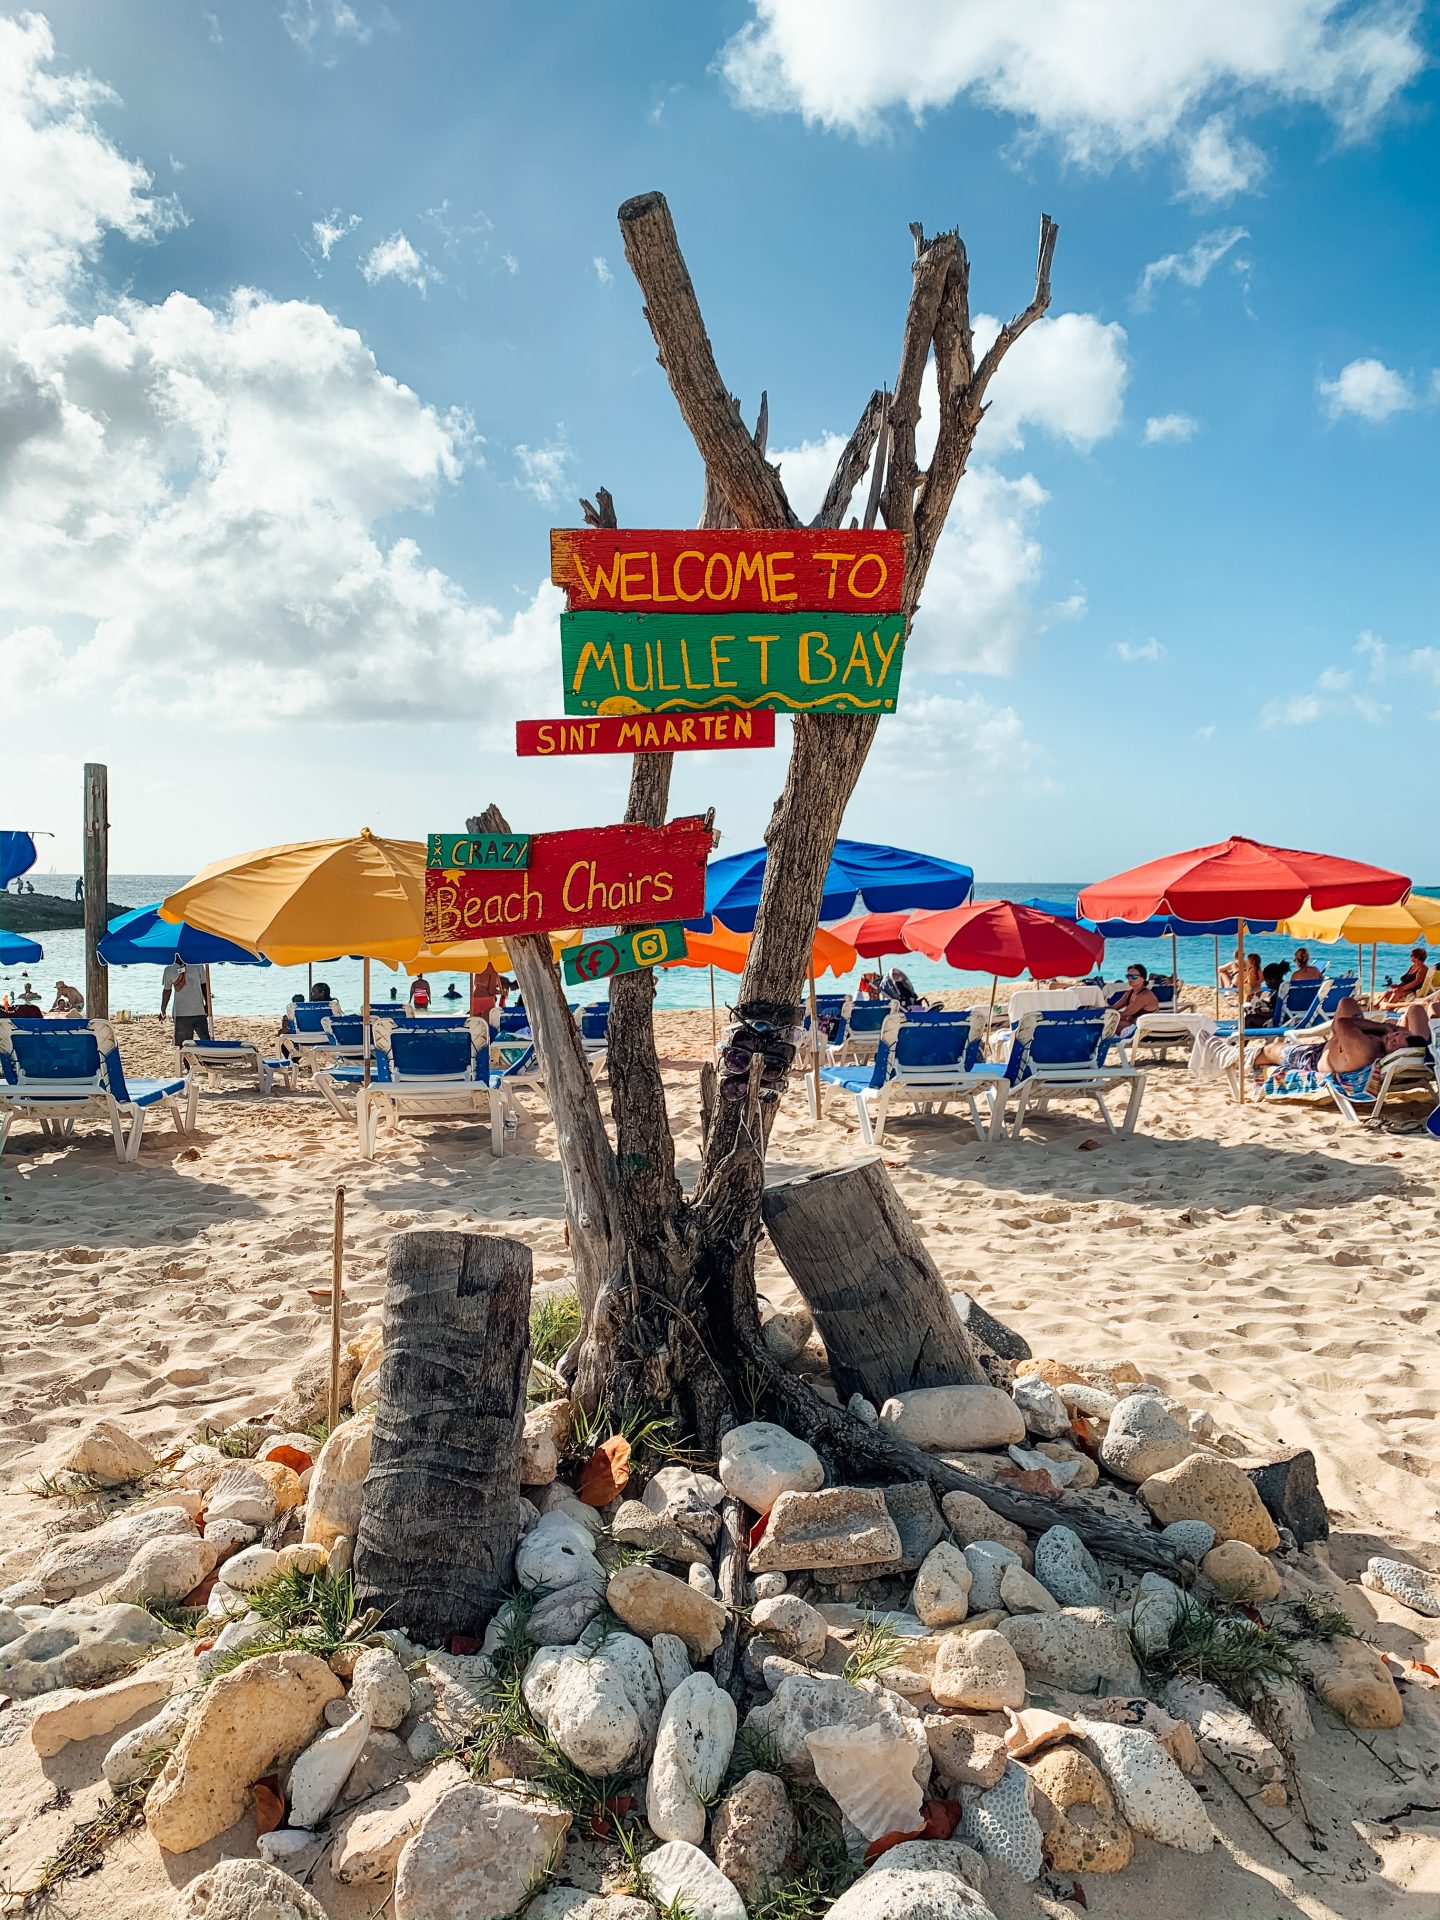 Mullet Bay Sint Maarten sign